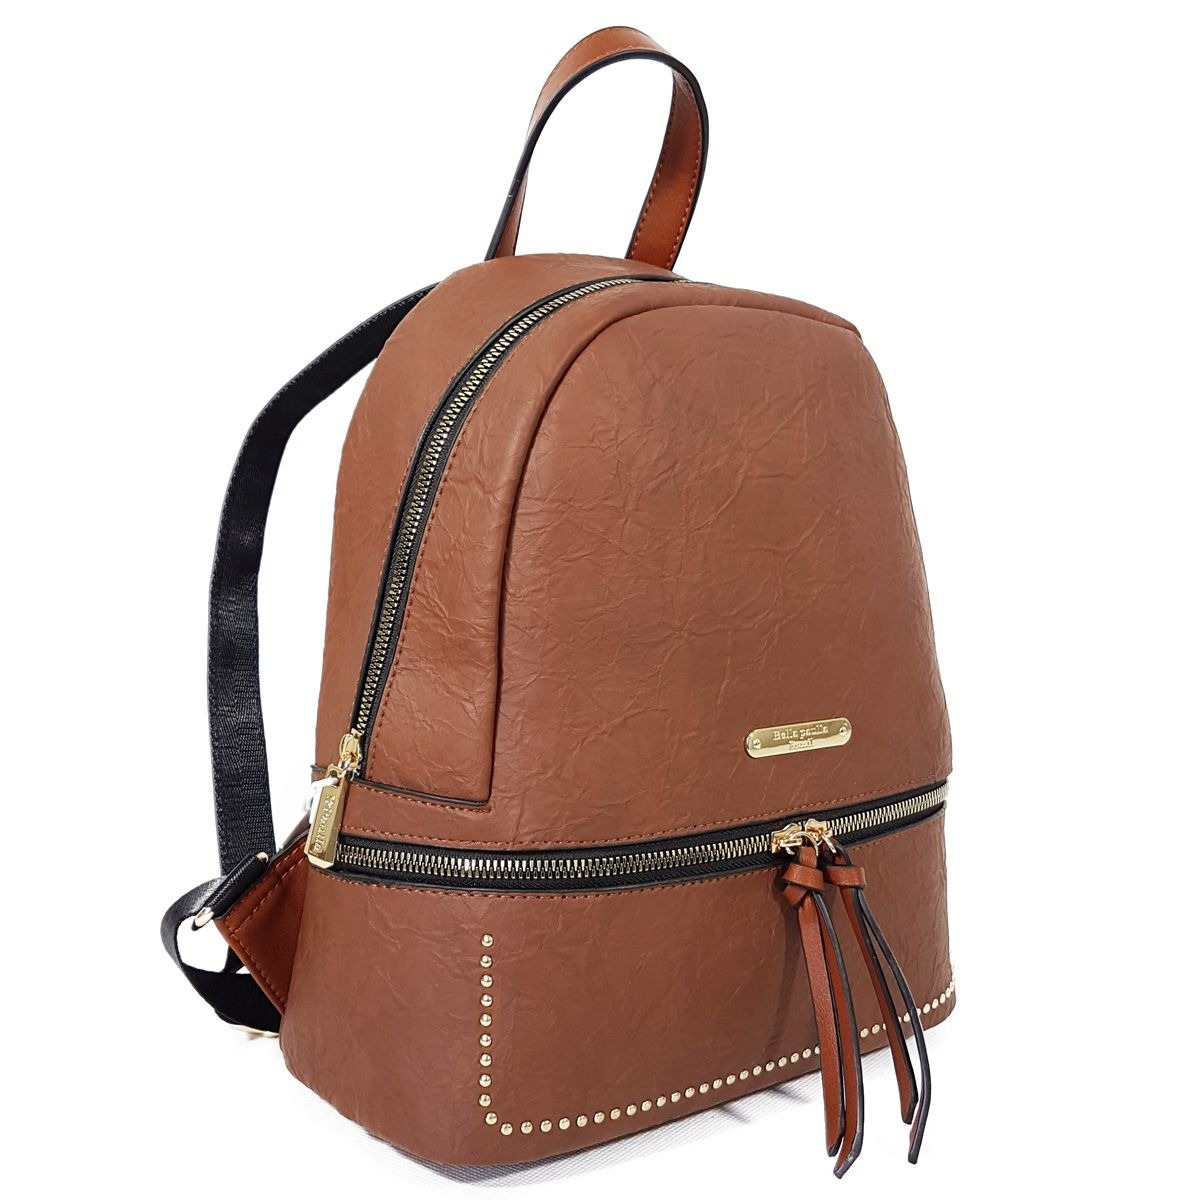 ccdb99275 bolsa mochila feminina executiva trabalho passeio premium. Carregando zoom.